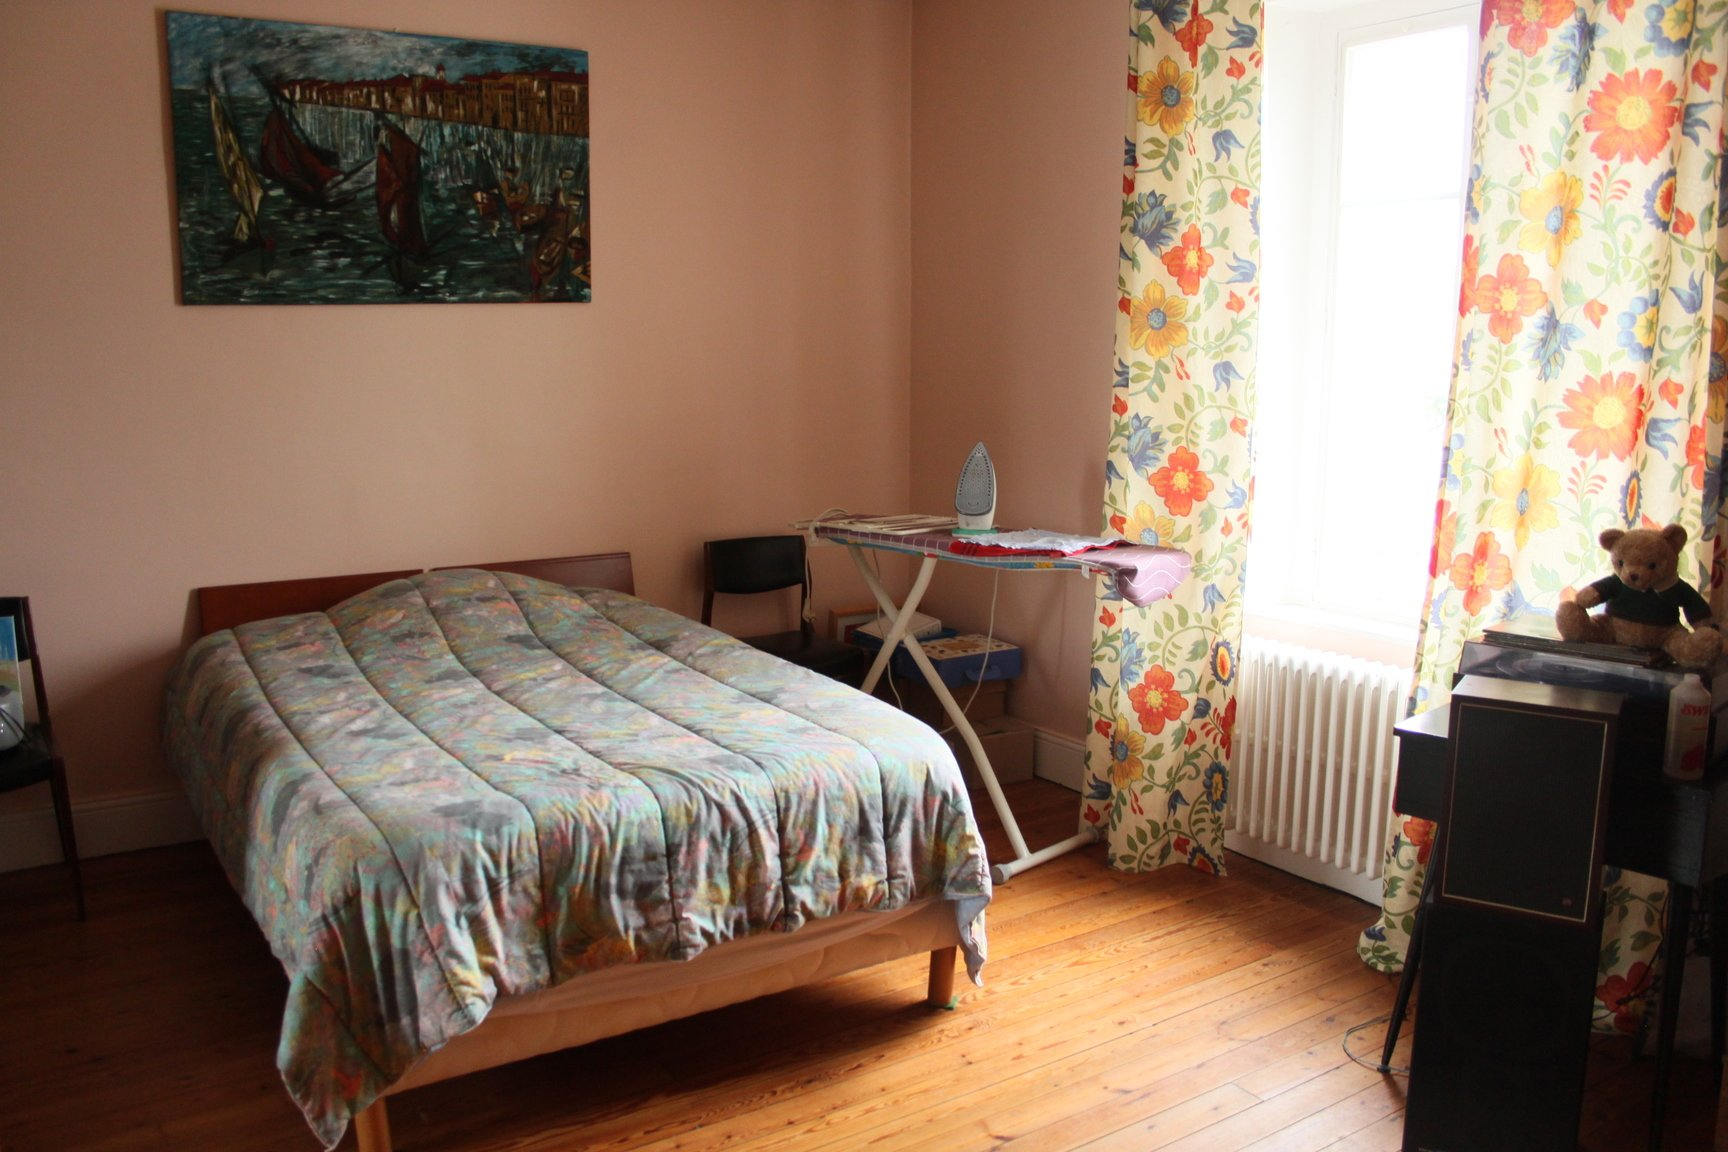 4 bedroom, 2 bathroom village house